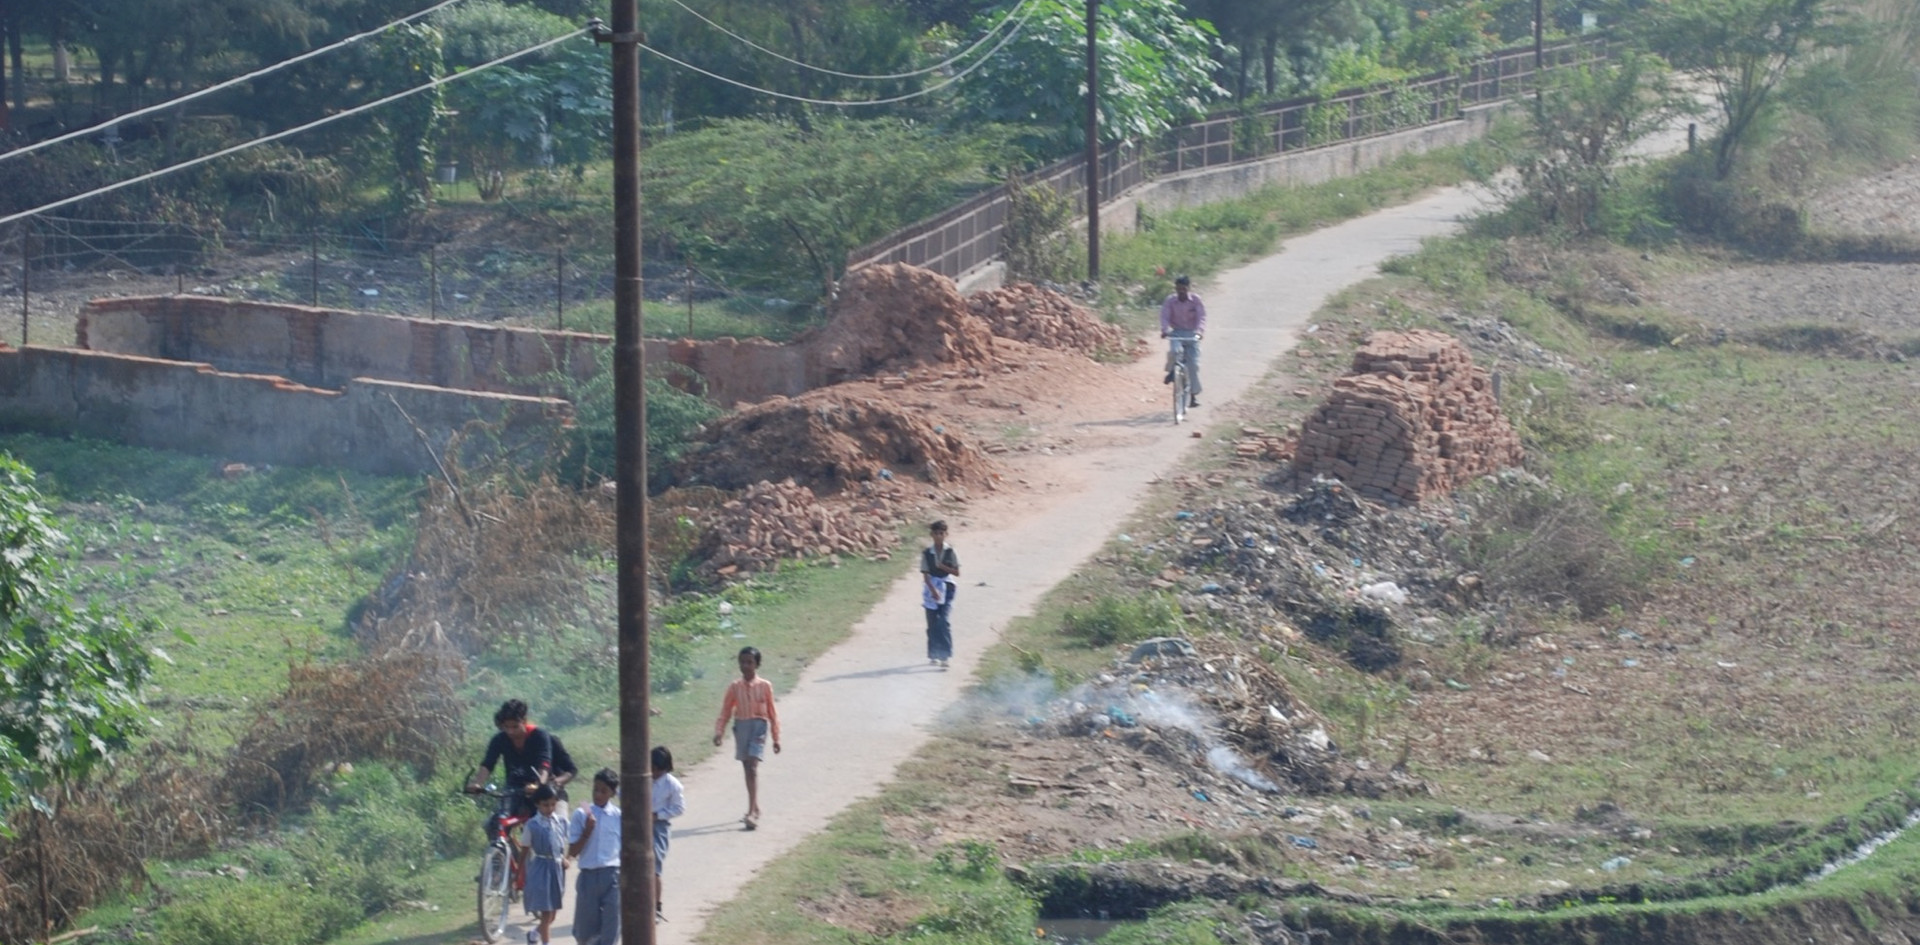 Kacchpura Village Entrance